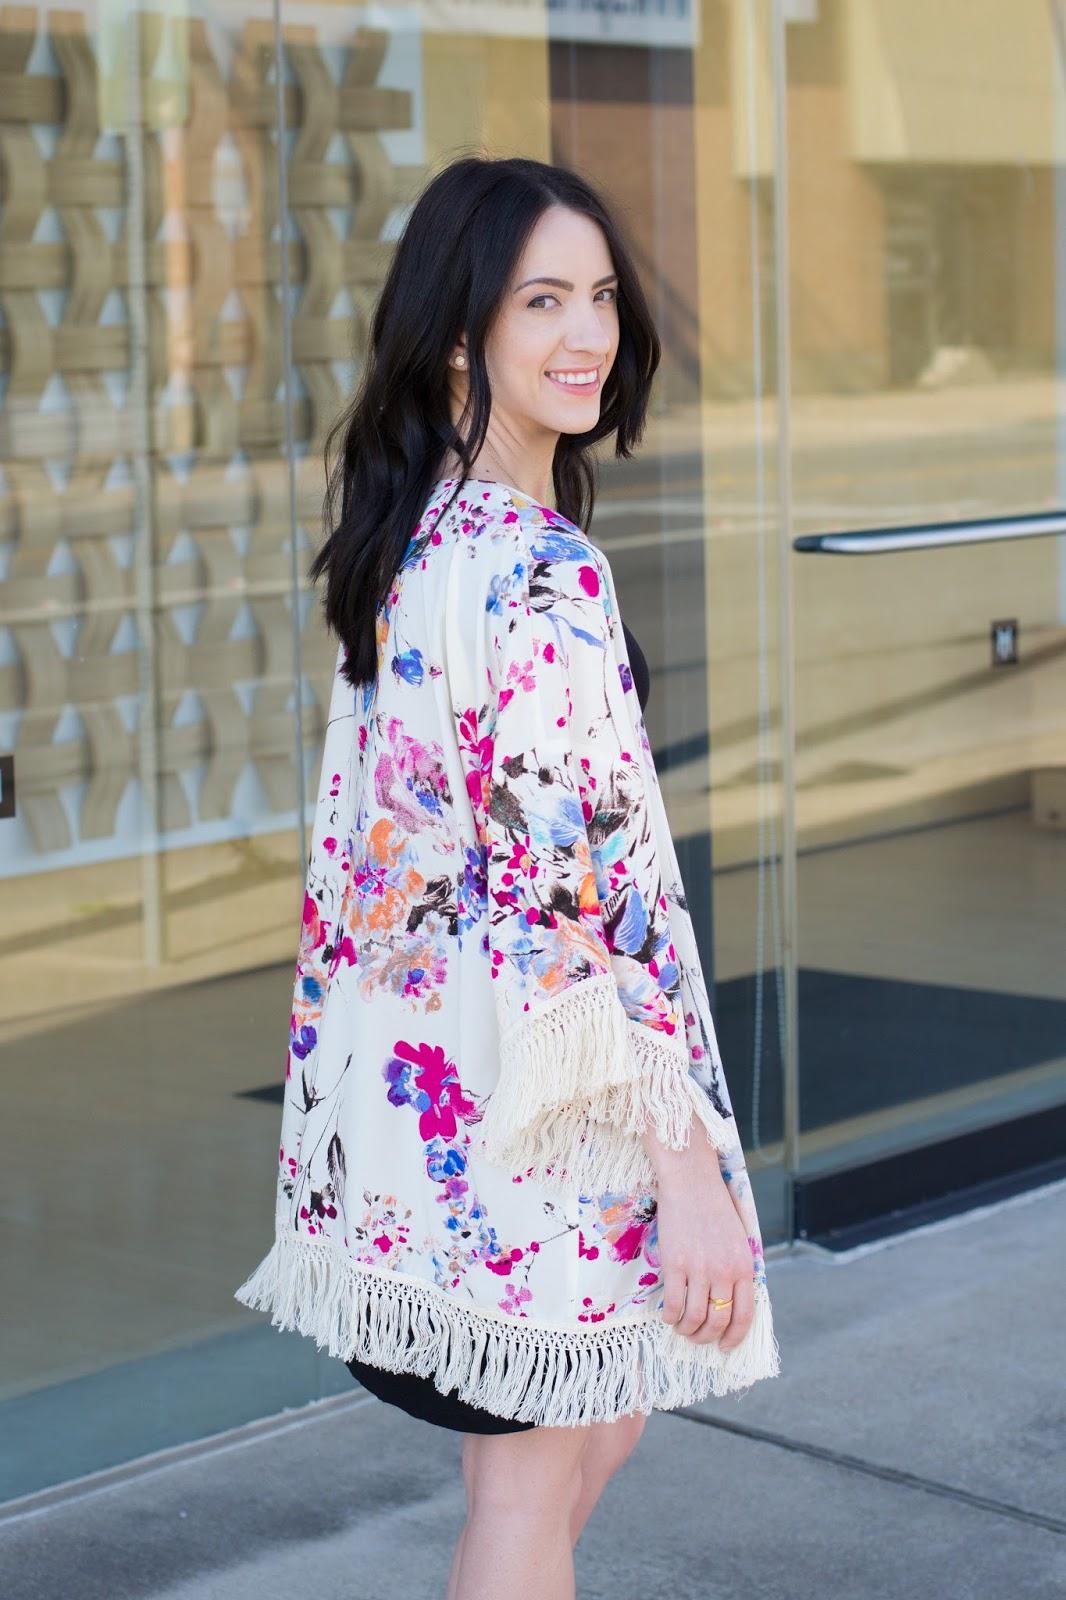 Bright colored floral kimono for summer style